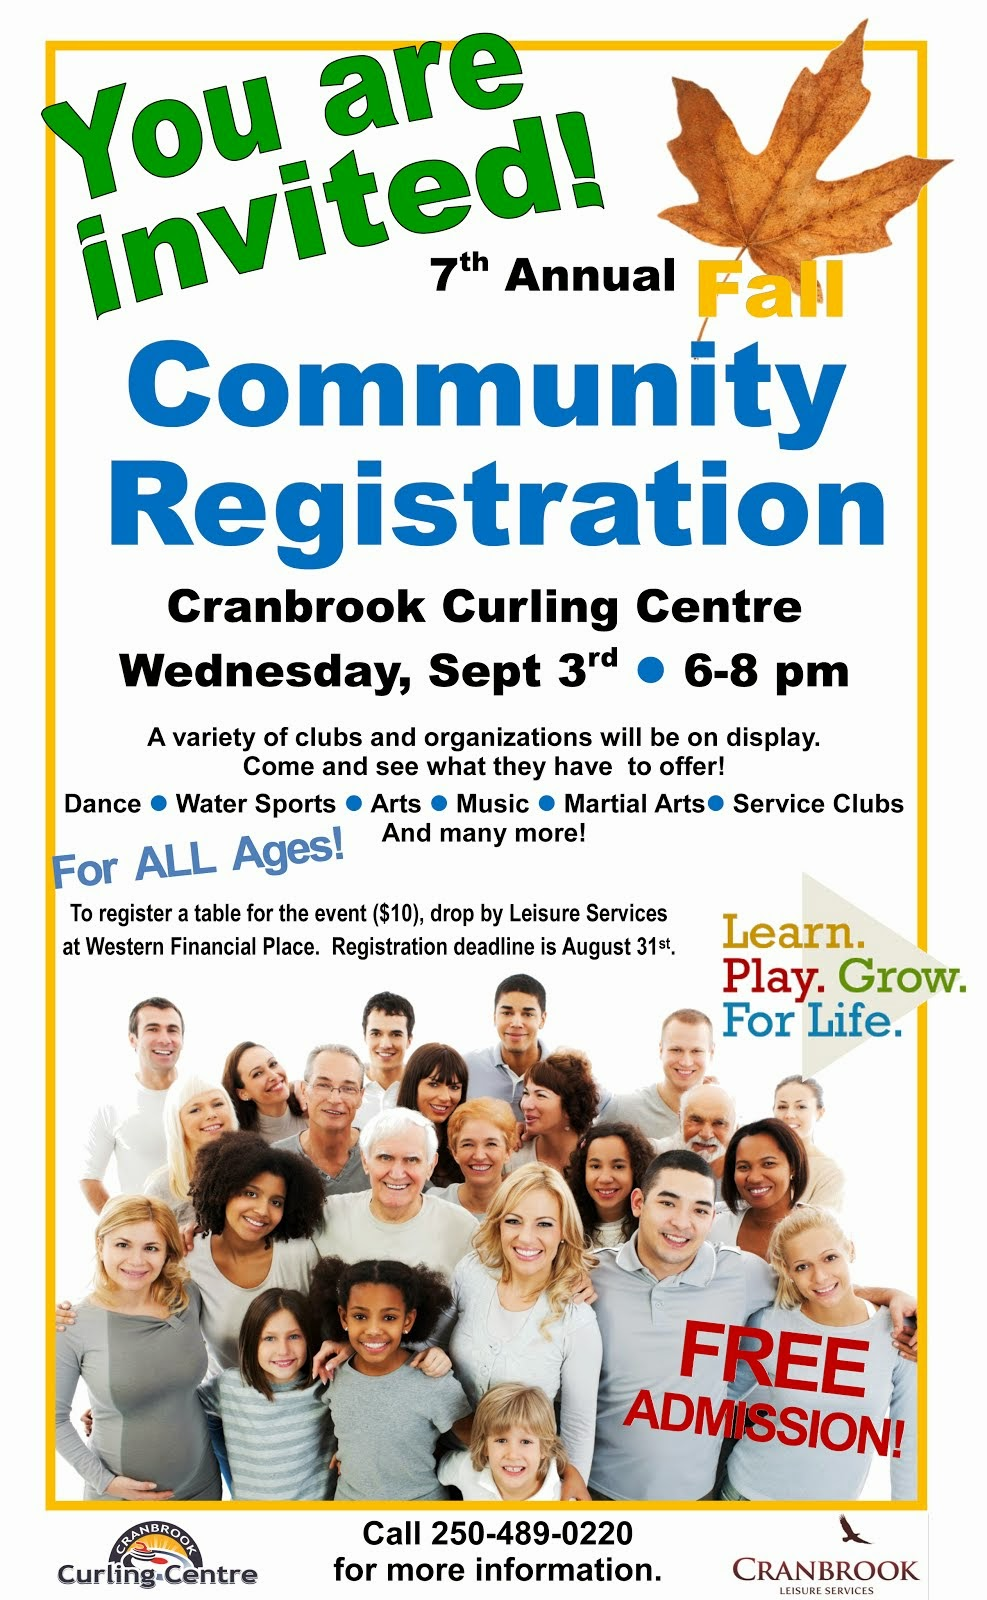 Community Registration